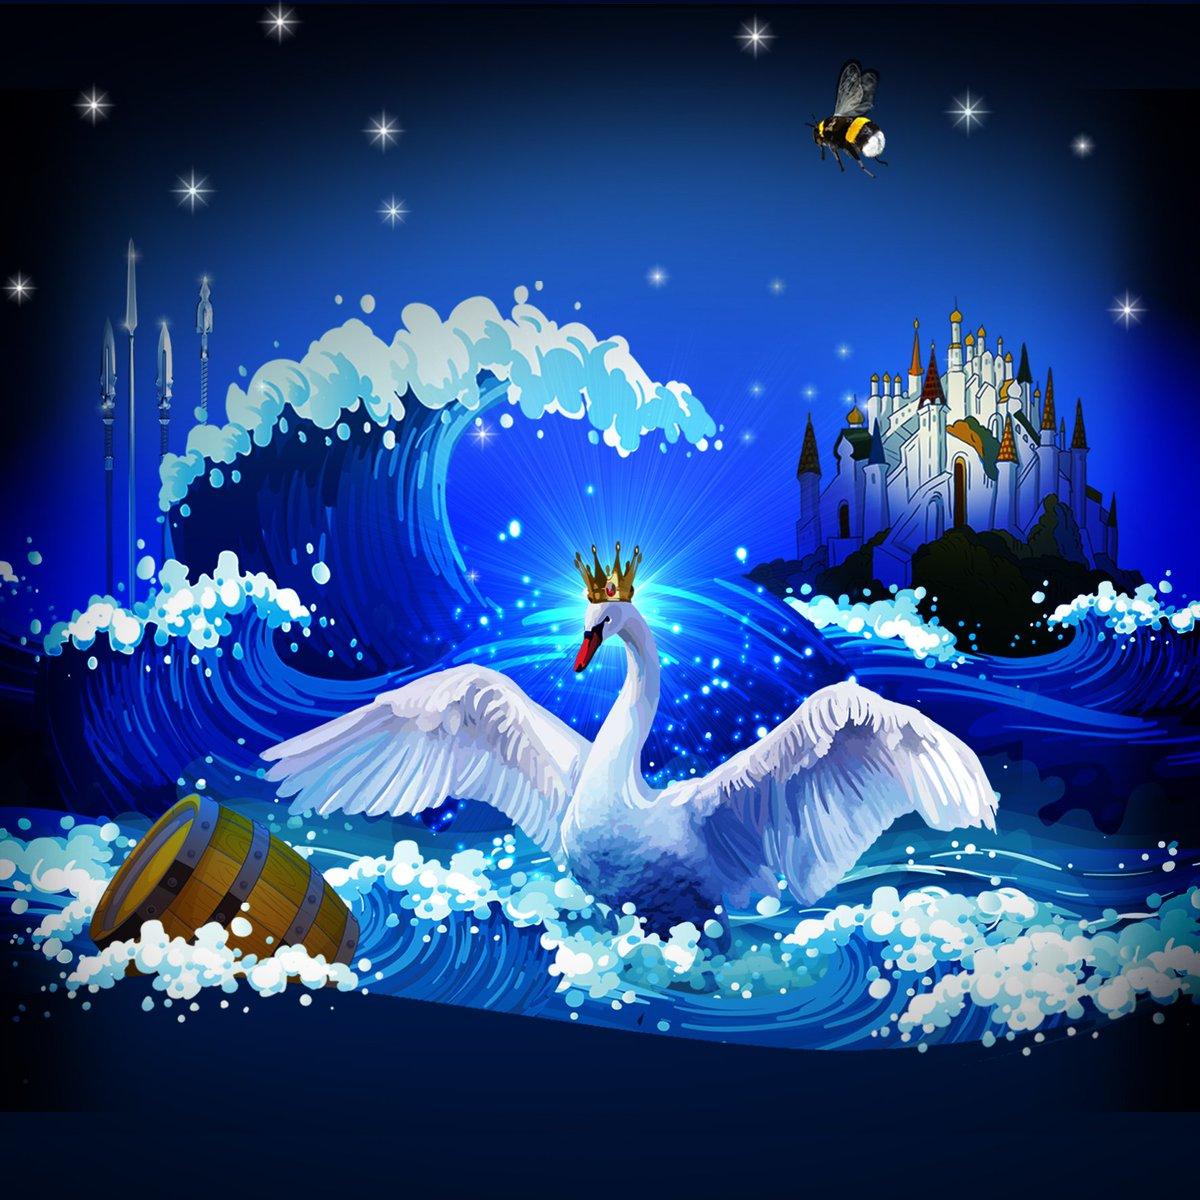 Картинка царь лебедь